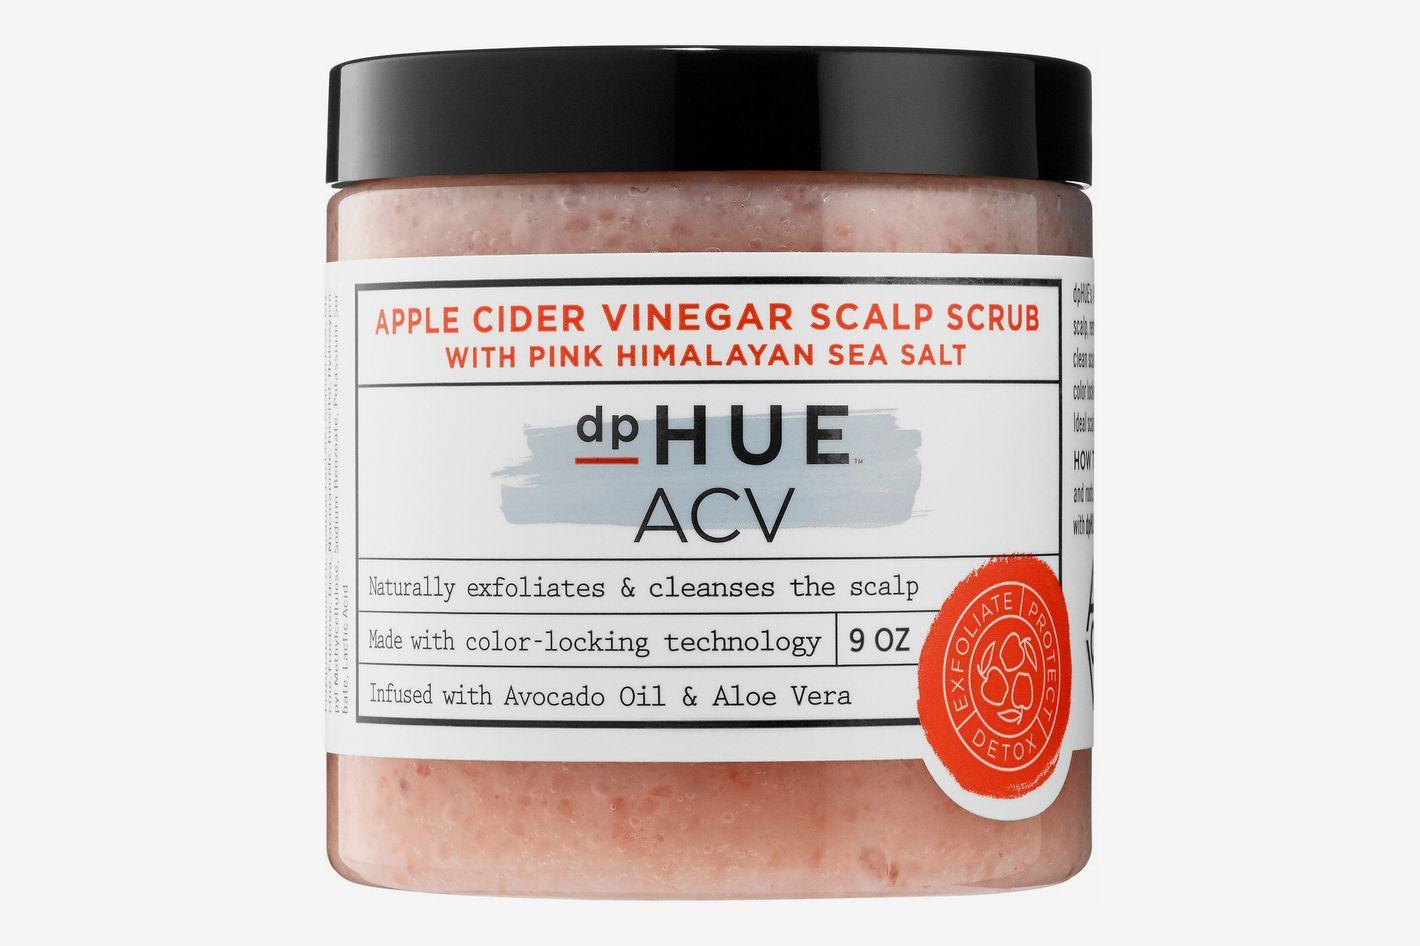 DpHUE Apple Cider Vinegar Sea Salt Scalp Scrub